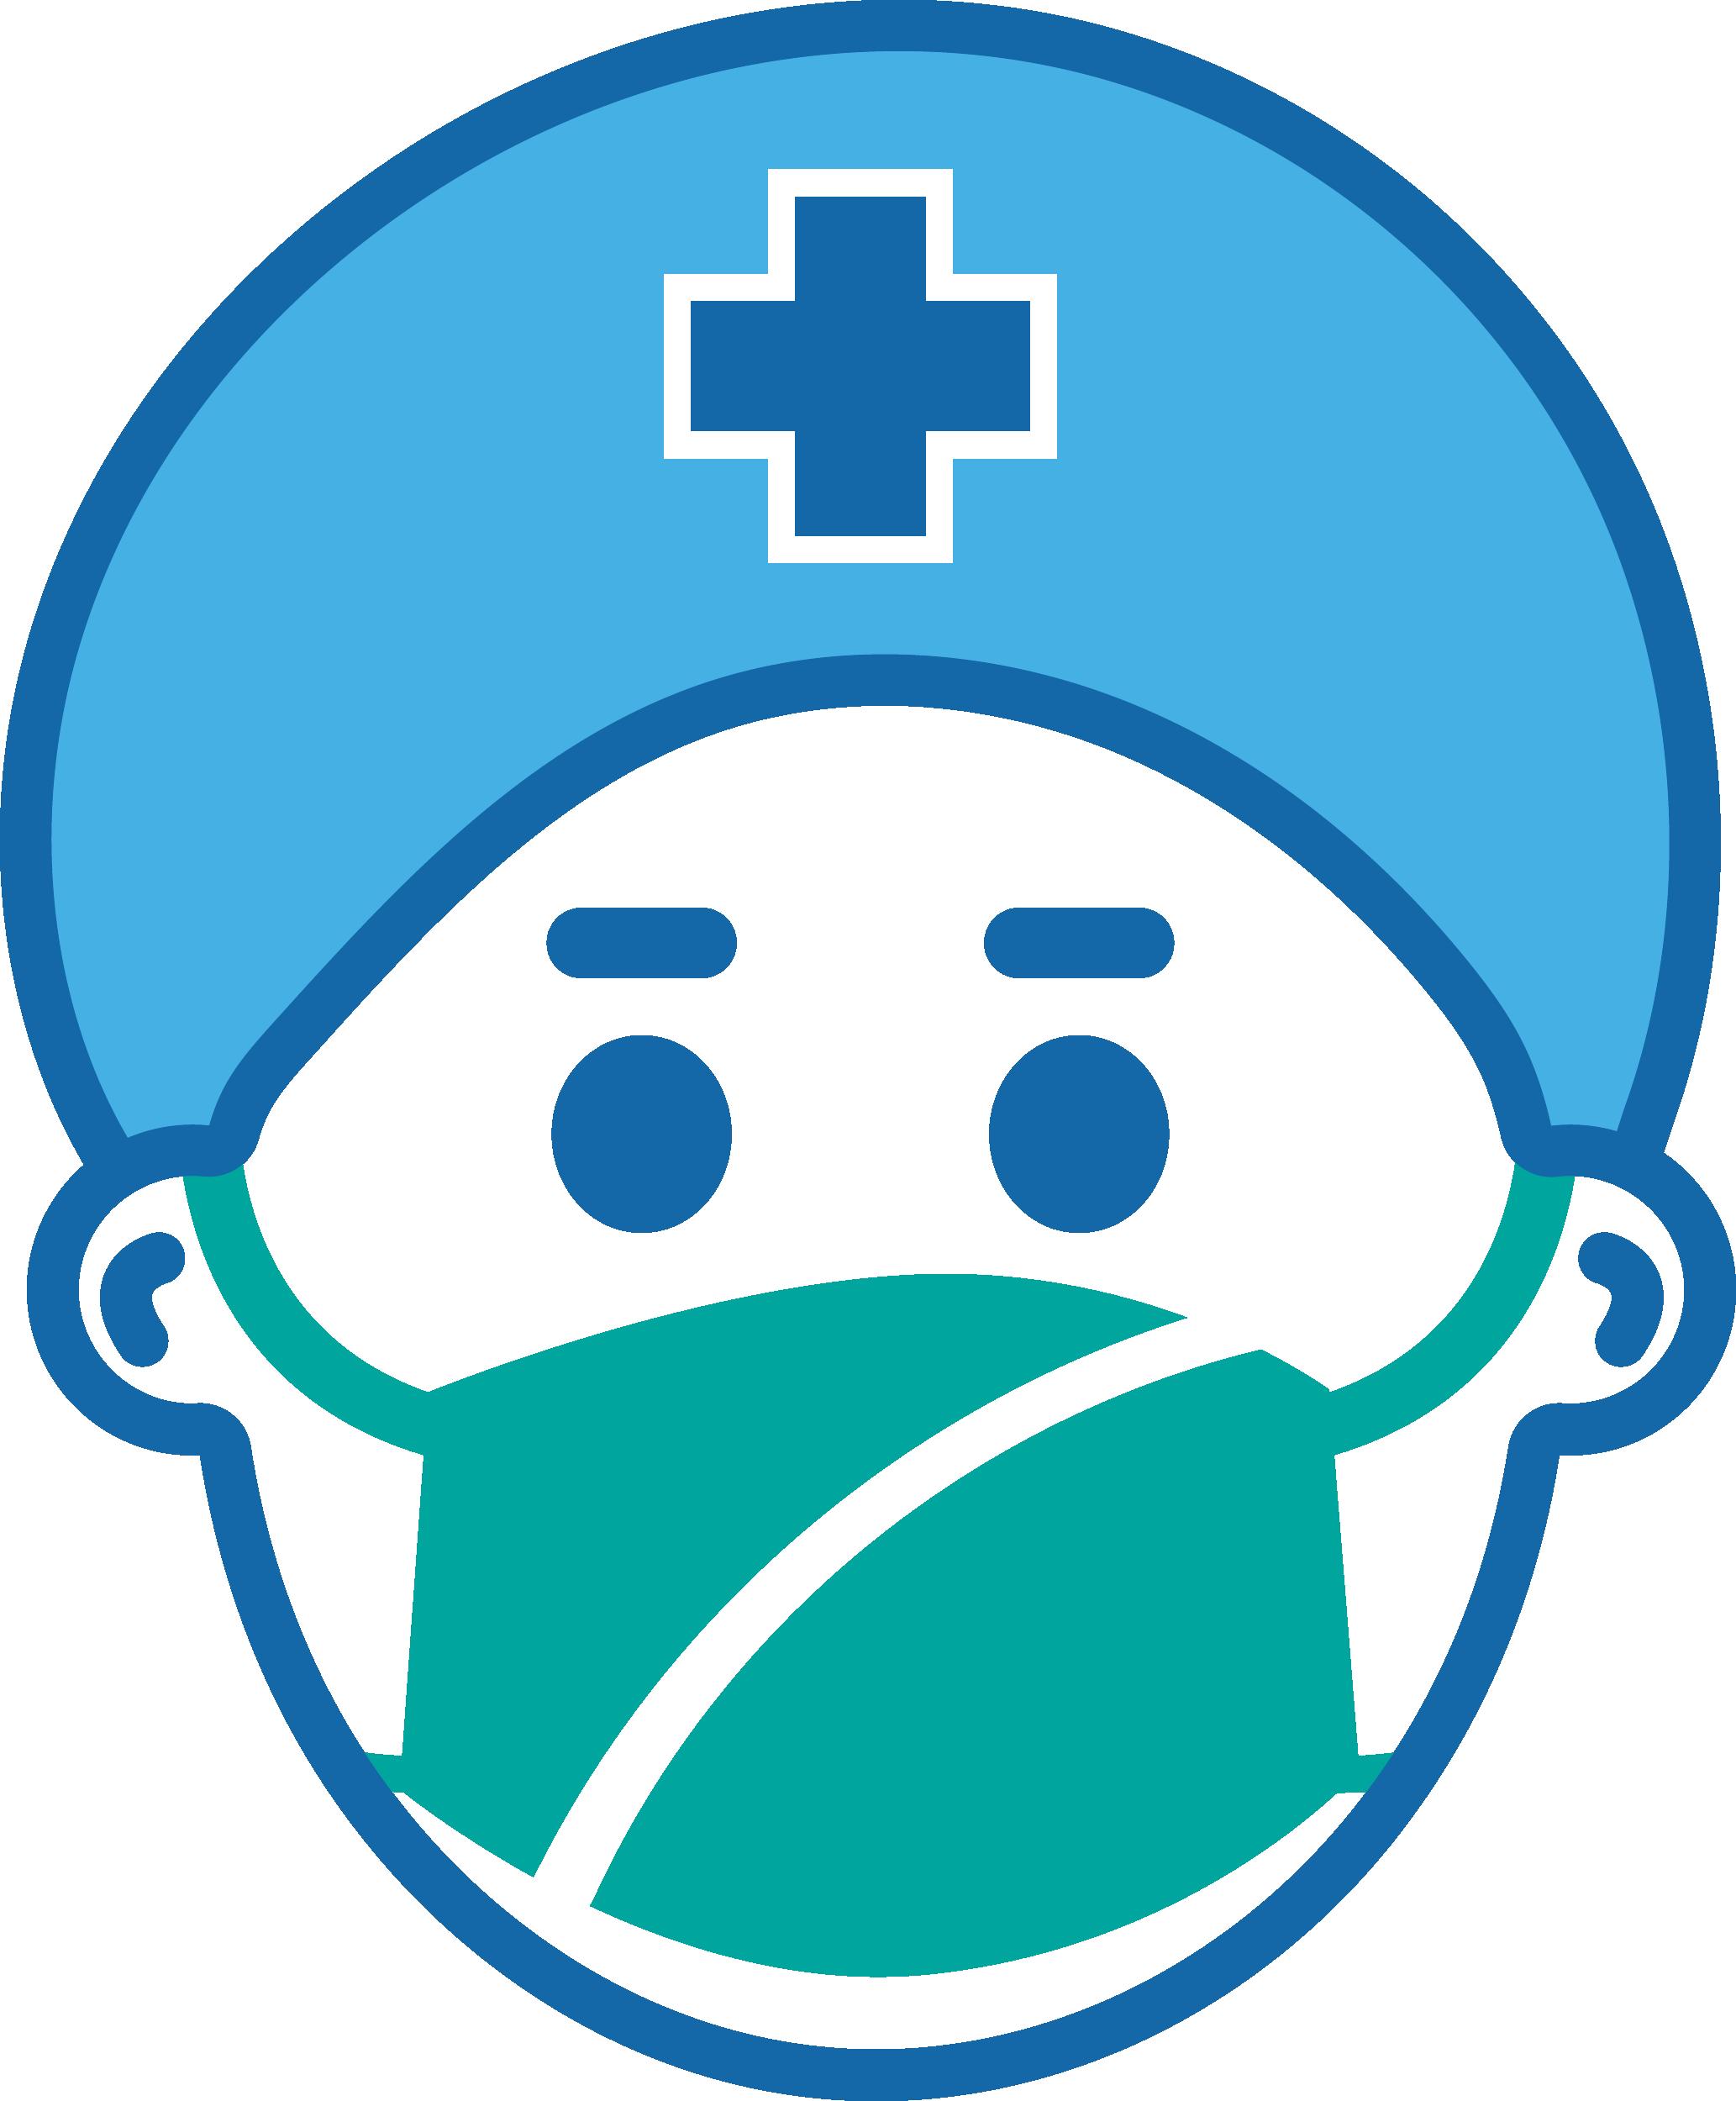 Male Nurse With Mask Coronavirus Disease covid-19 Free DXF File